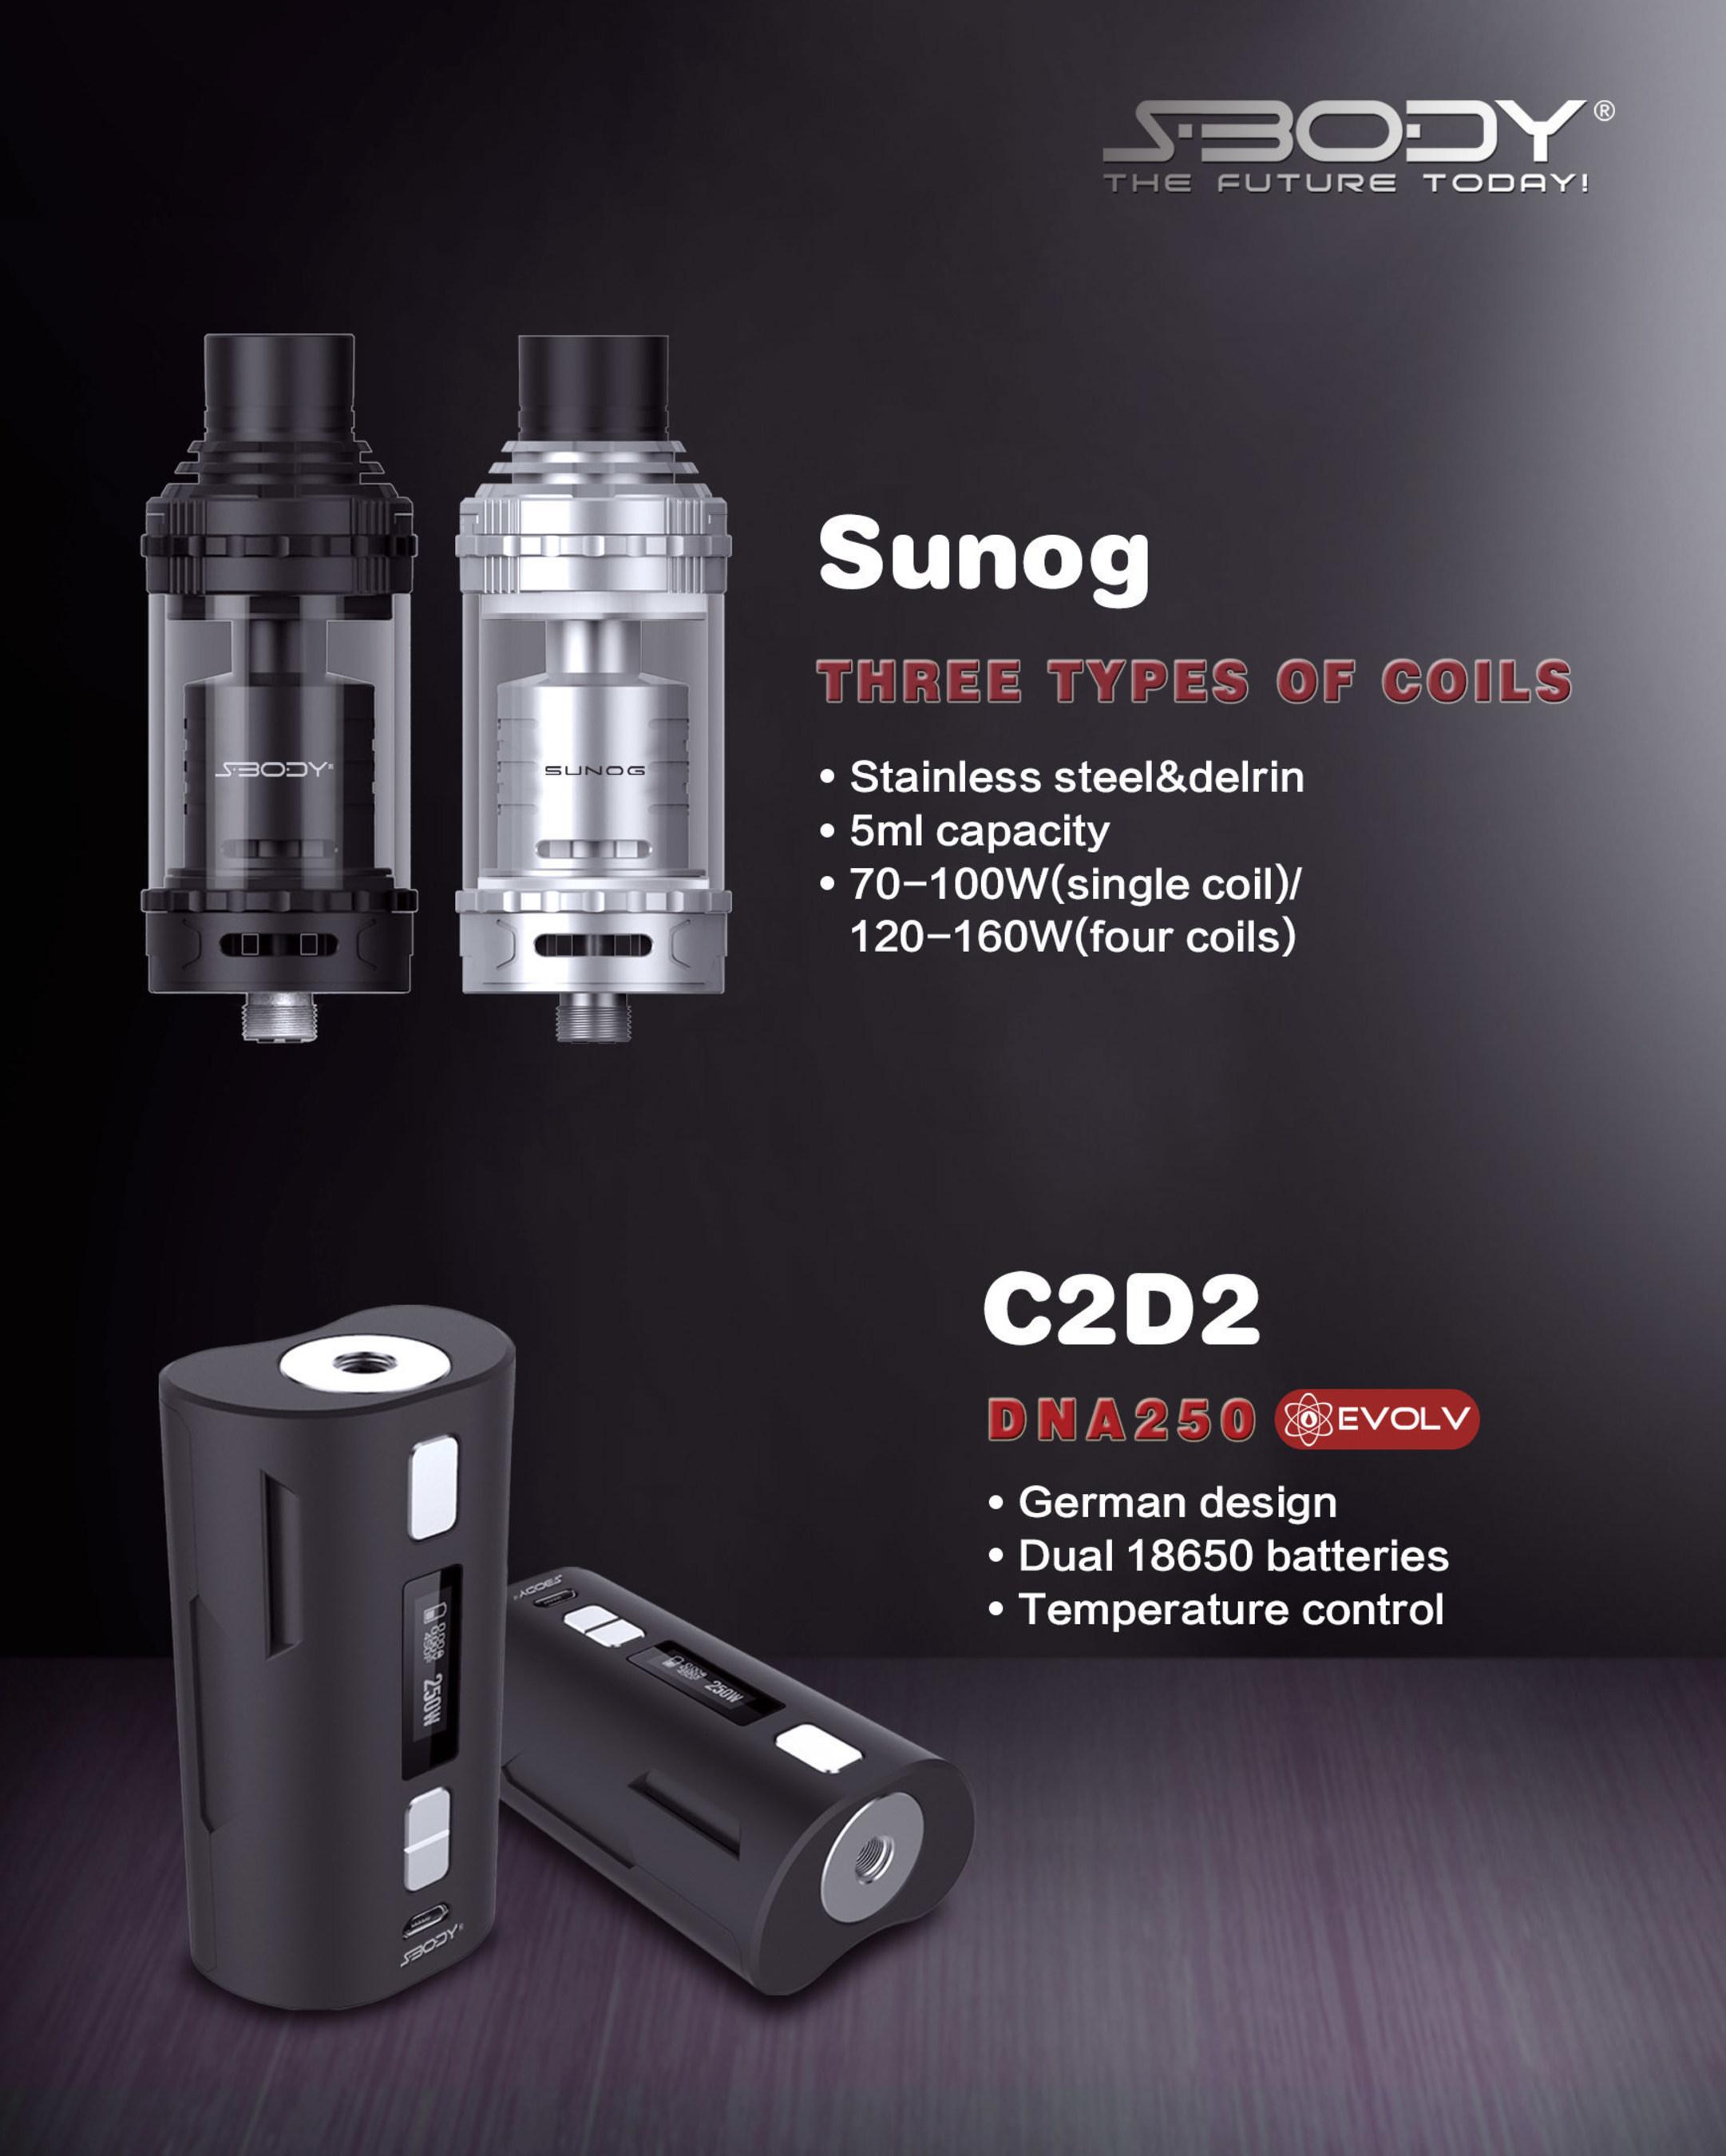 S-BODY Sunog RTA tank and VapeDroid C2D2 dna250w mod